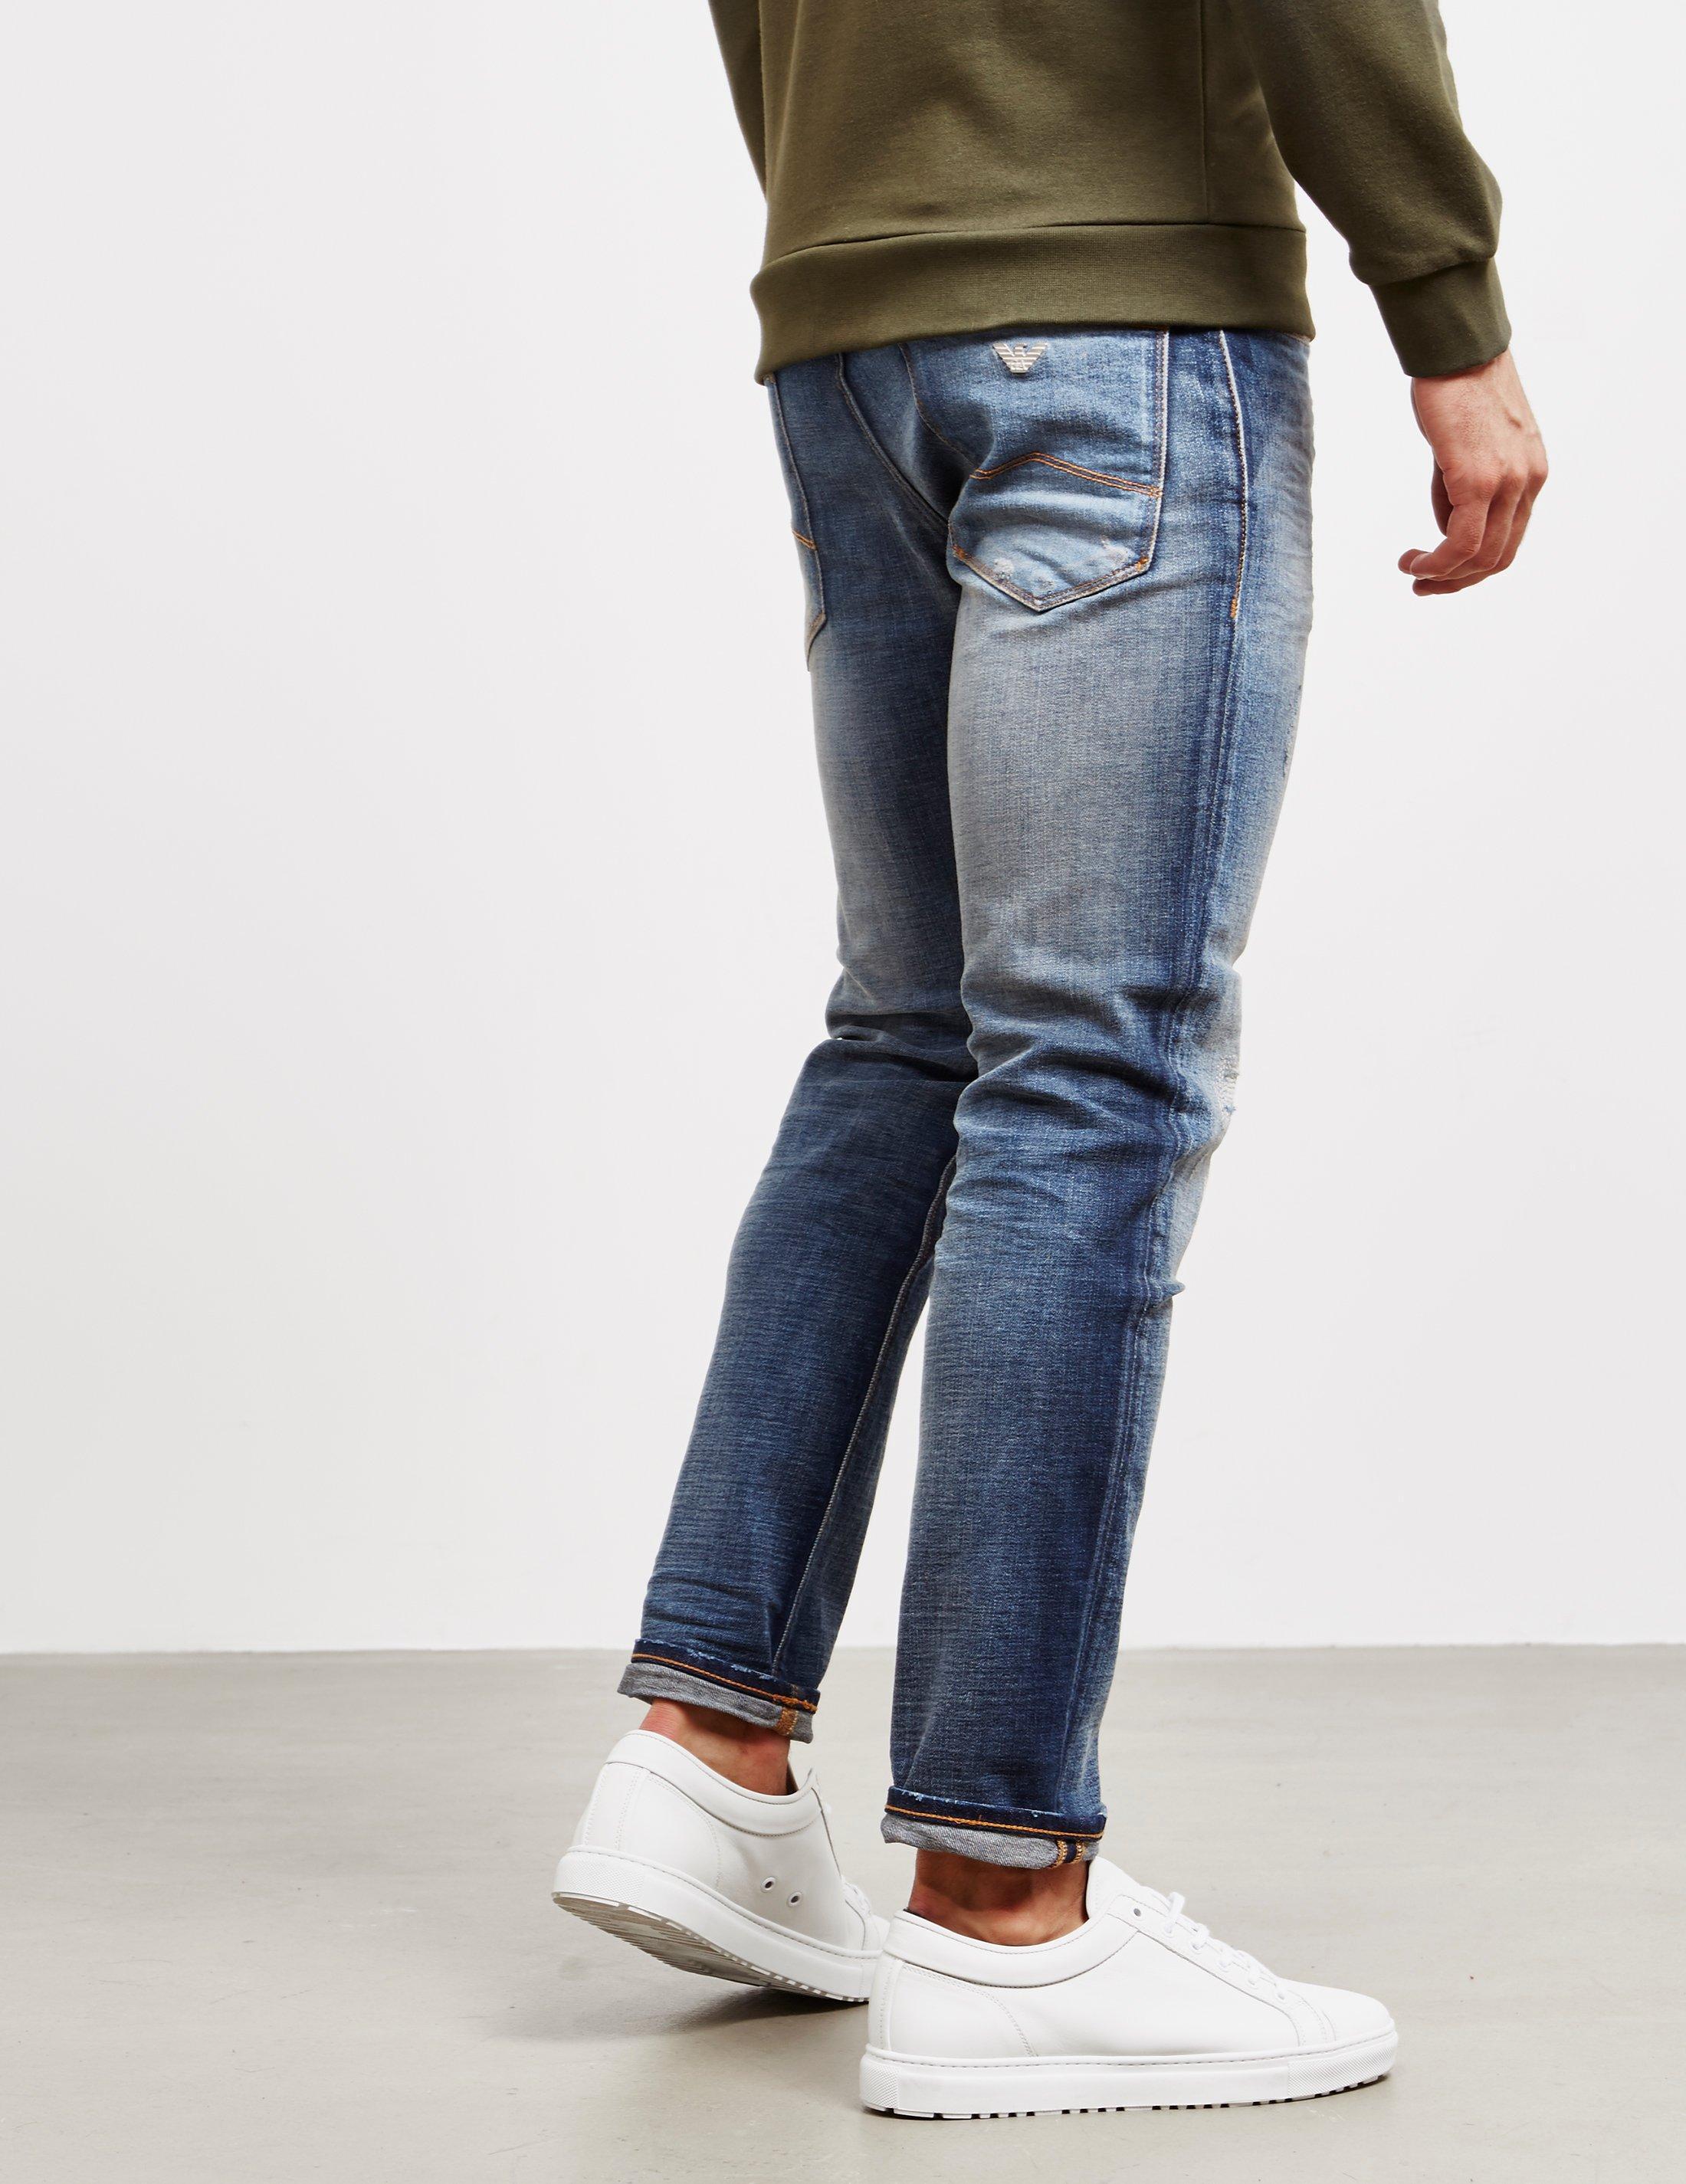 f13889b7a19 Lyst - Emporio Armani J06 Slim Distressed Jeans Blue in Blue for Men ...